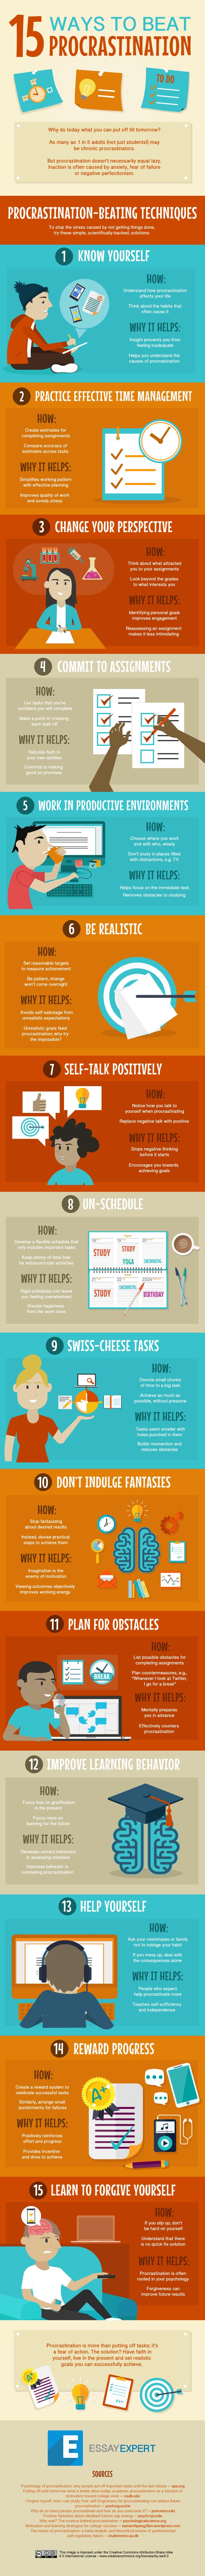 15 Ways to Beat Procrastination Infographic